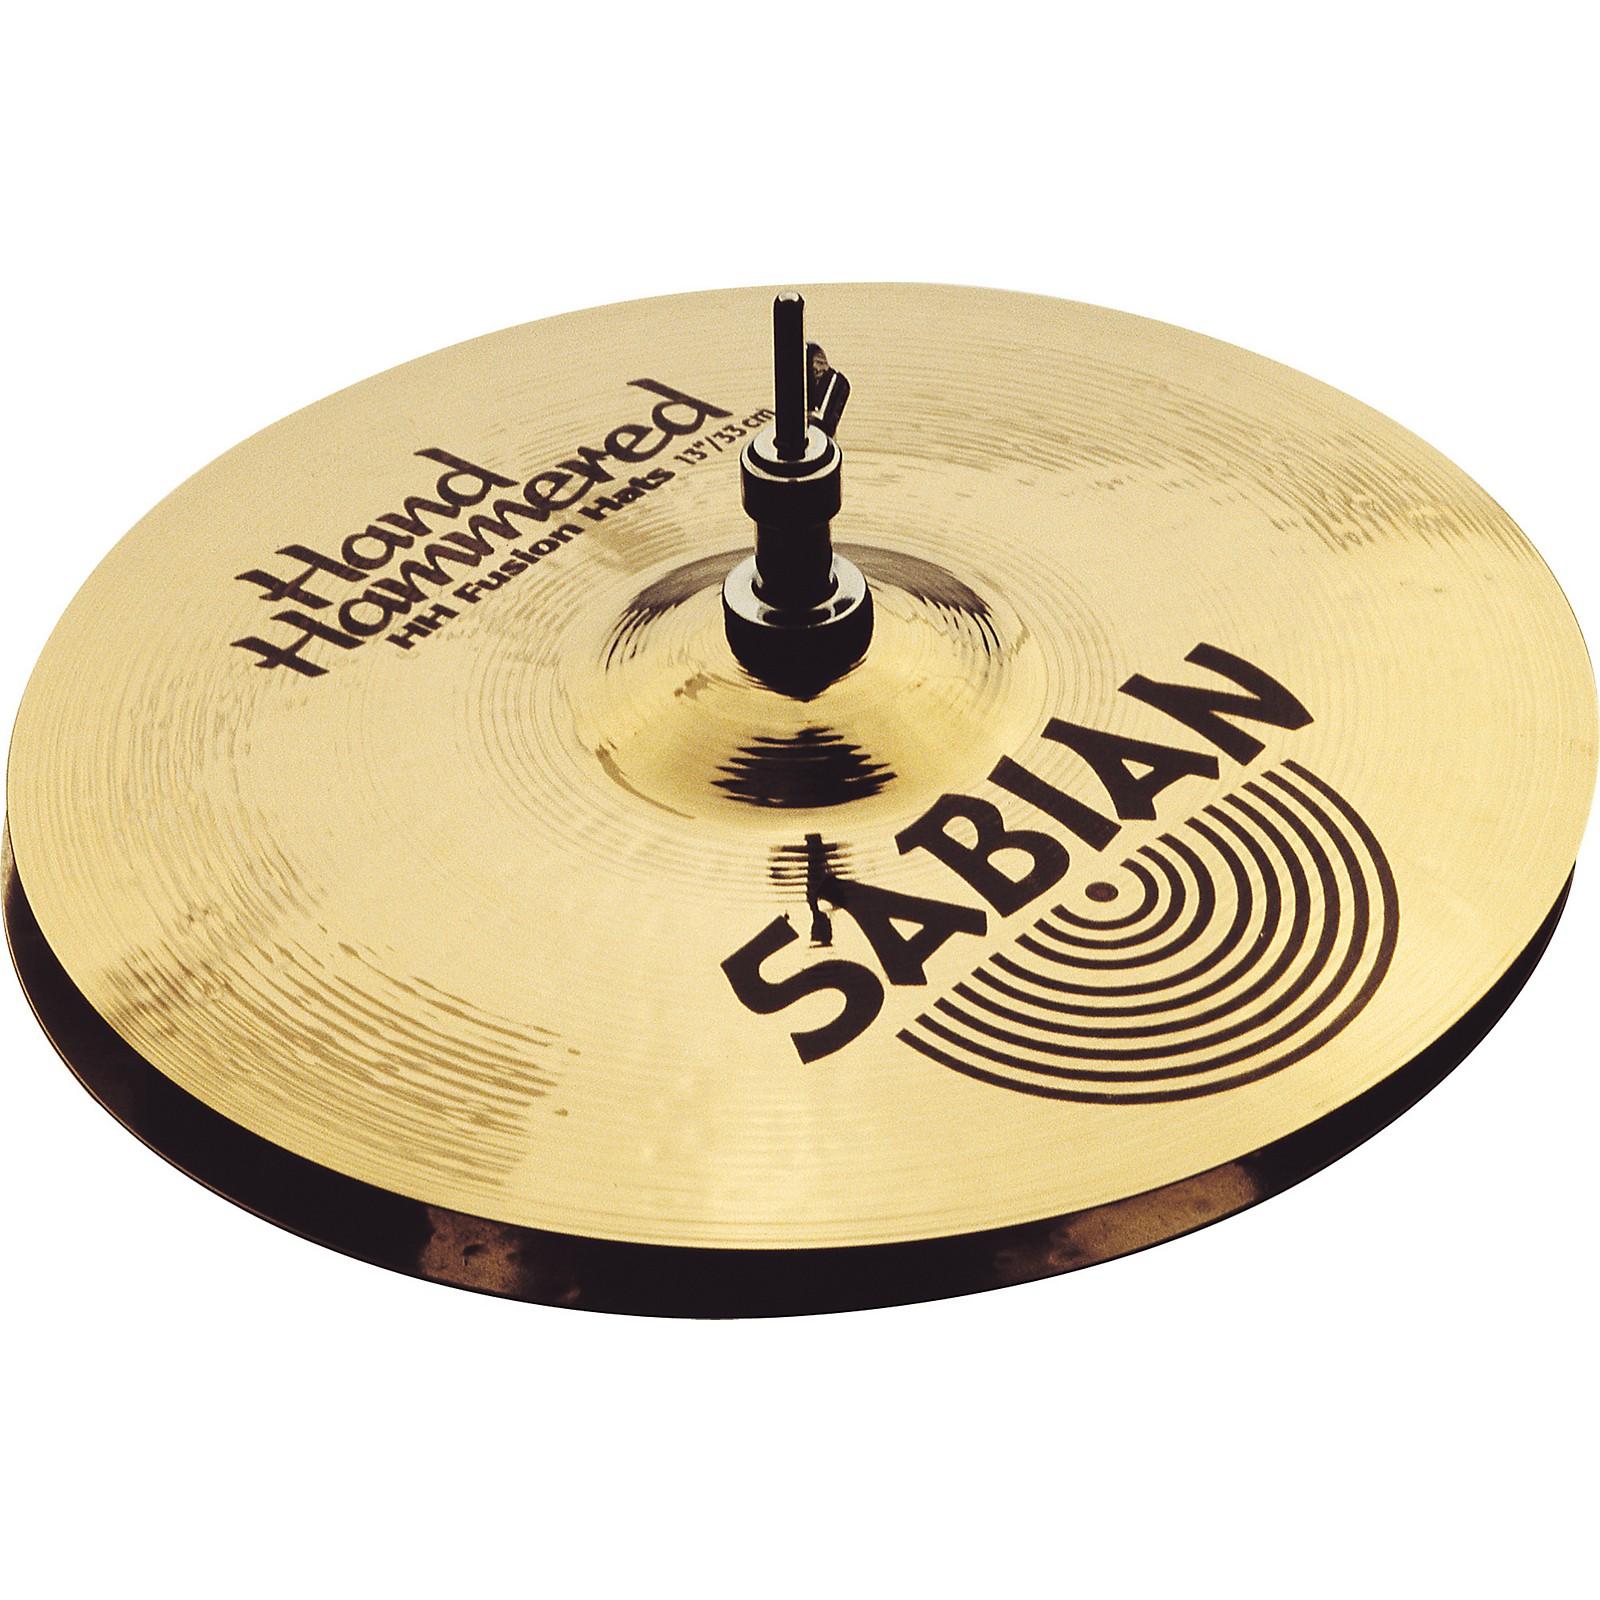 Sabian Hand Hammered Fusion Hi-Hat Cymbals 13